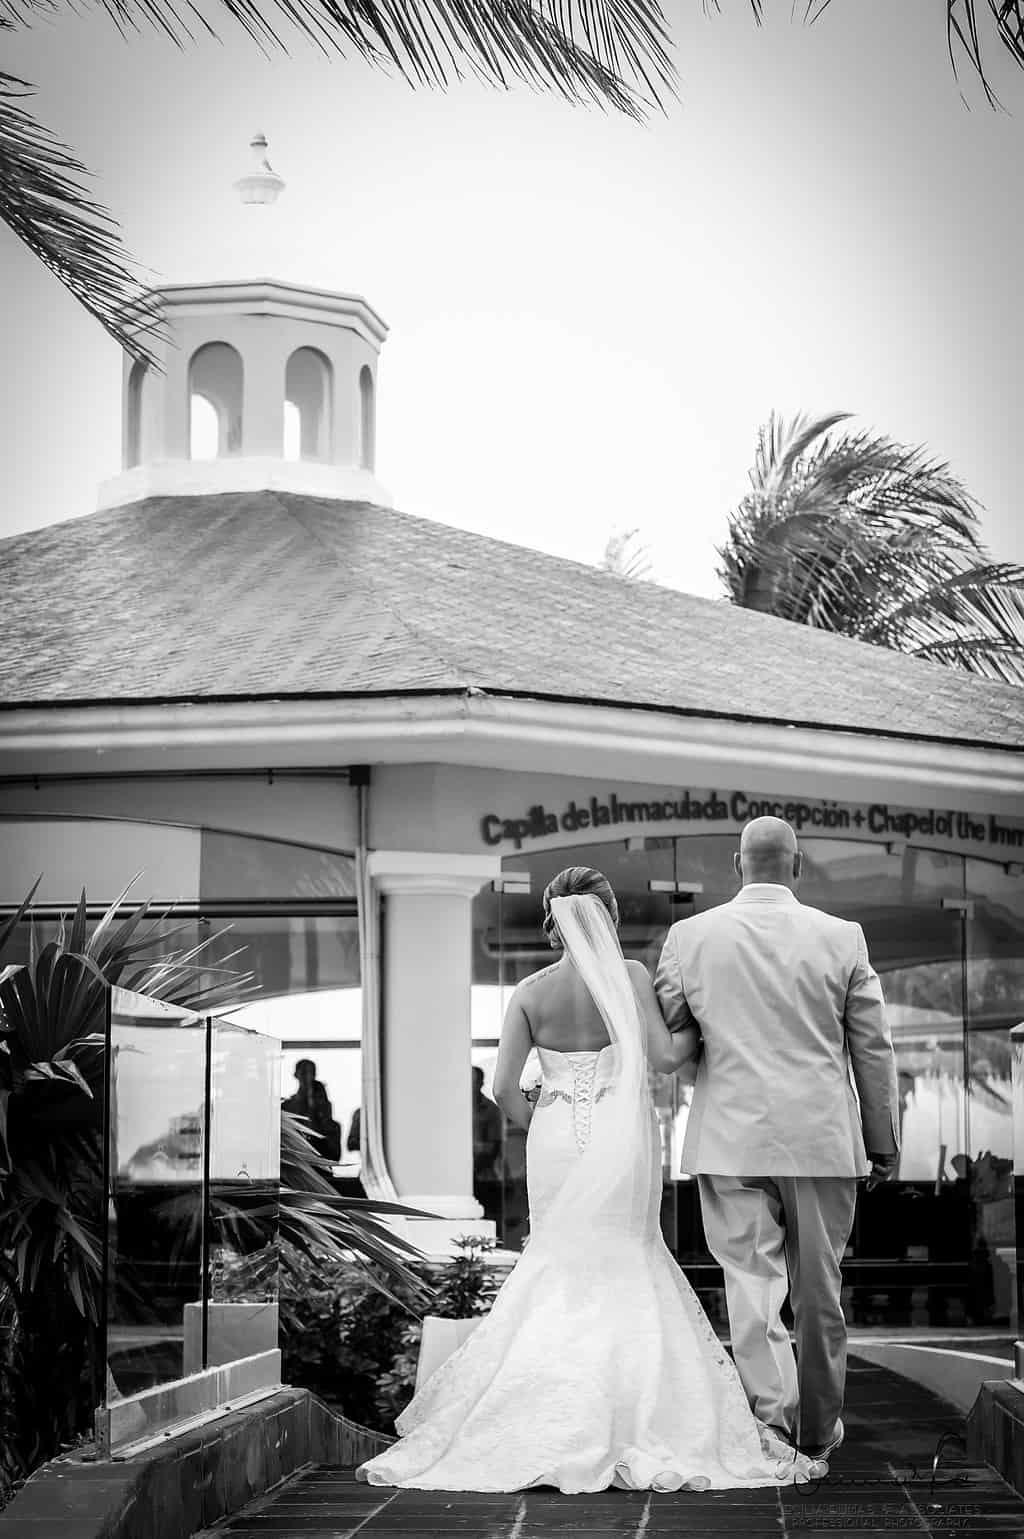 cancun-moonpalacehotel-weddingphotography38